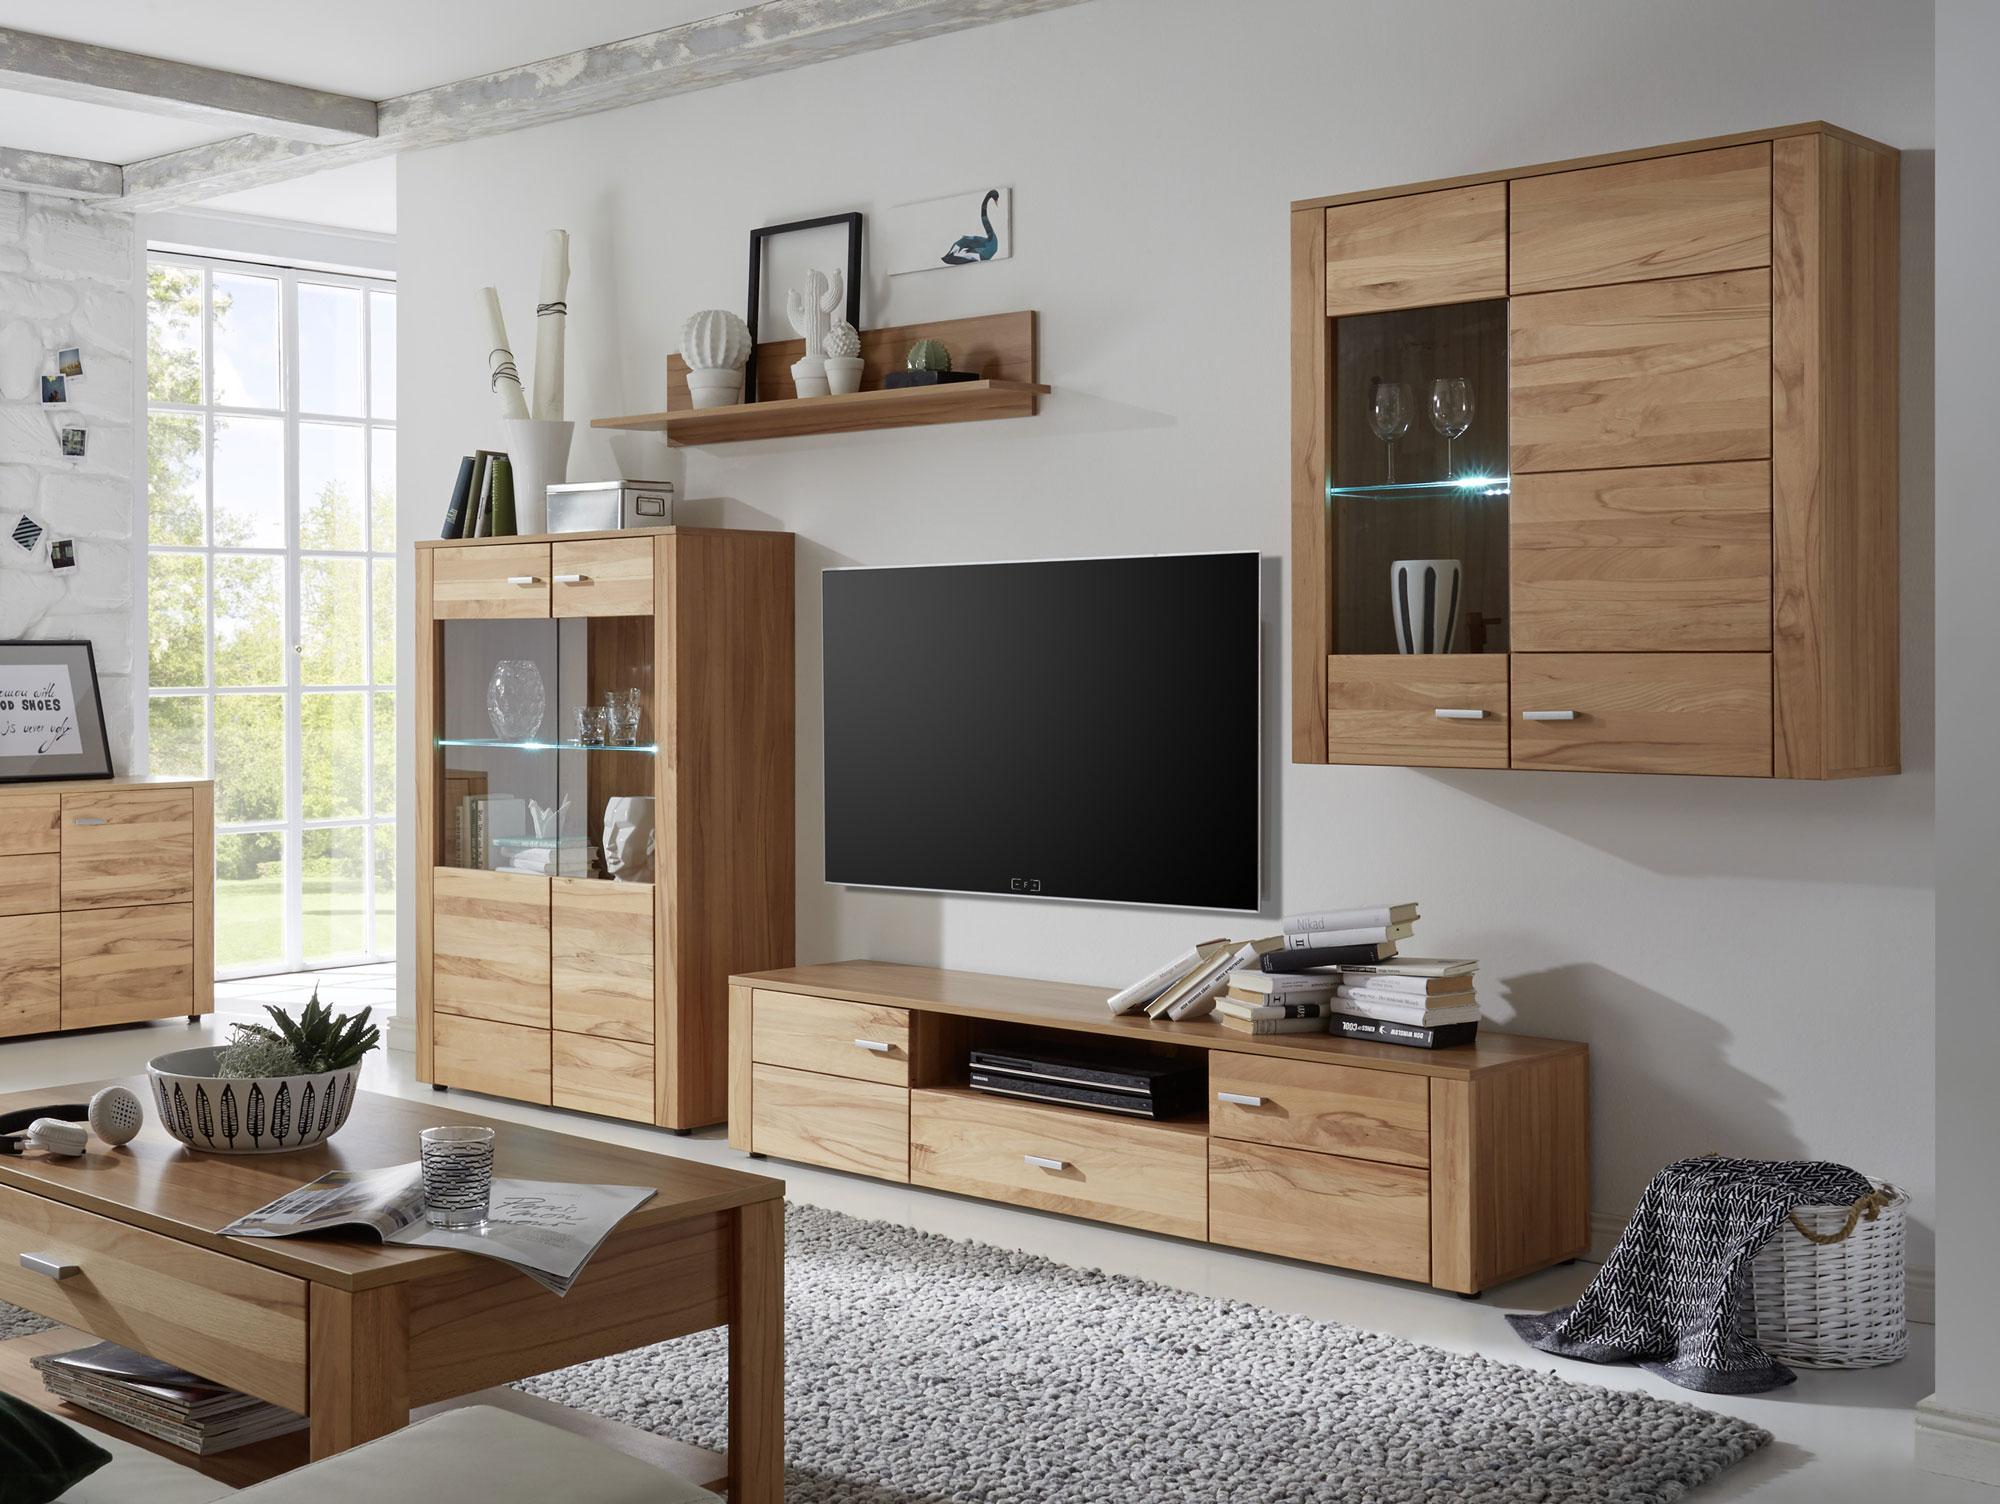 wohnwand kernbuche cool wohnwand kernbuche gelt massiv with wohnwand kernbuche cool wohnwand. Black Bedroom Furniture Sets. Home Design Ideas